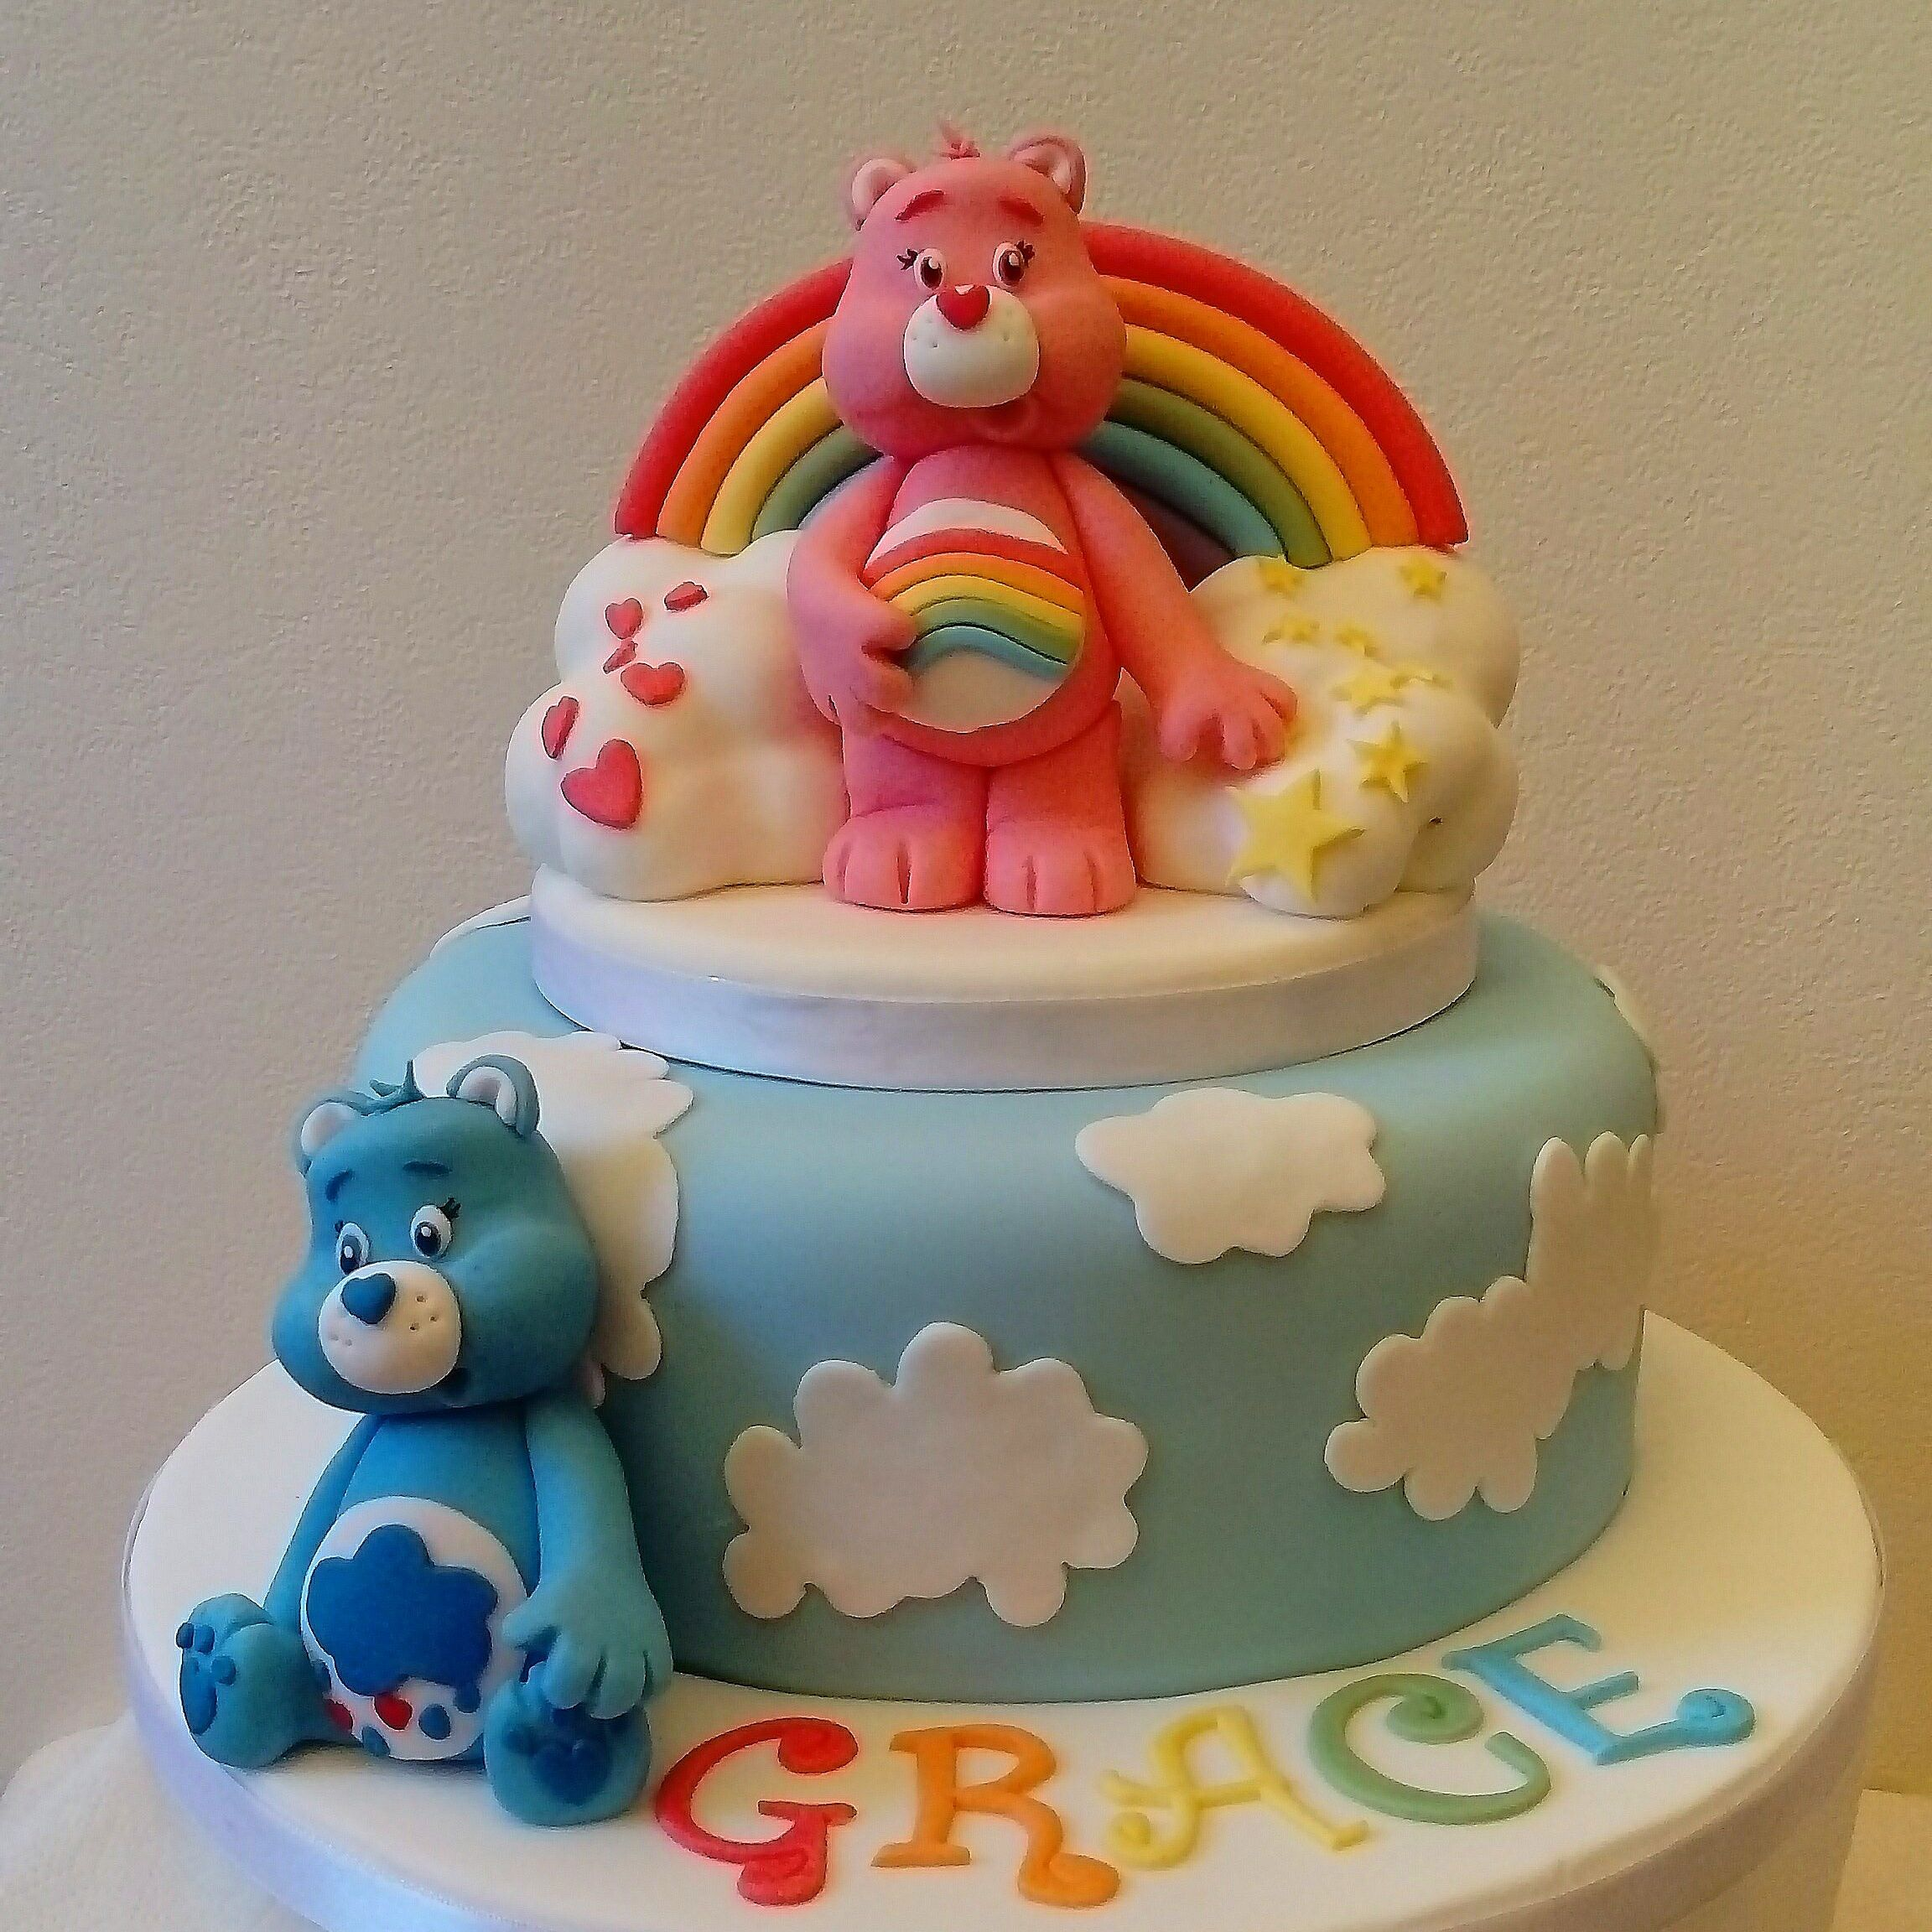 Wondrous Care Bears Birthday Cake Care Bear Cakes Birthday Party Cake Funny Birthday Cards Online Alyptdamsfinfo